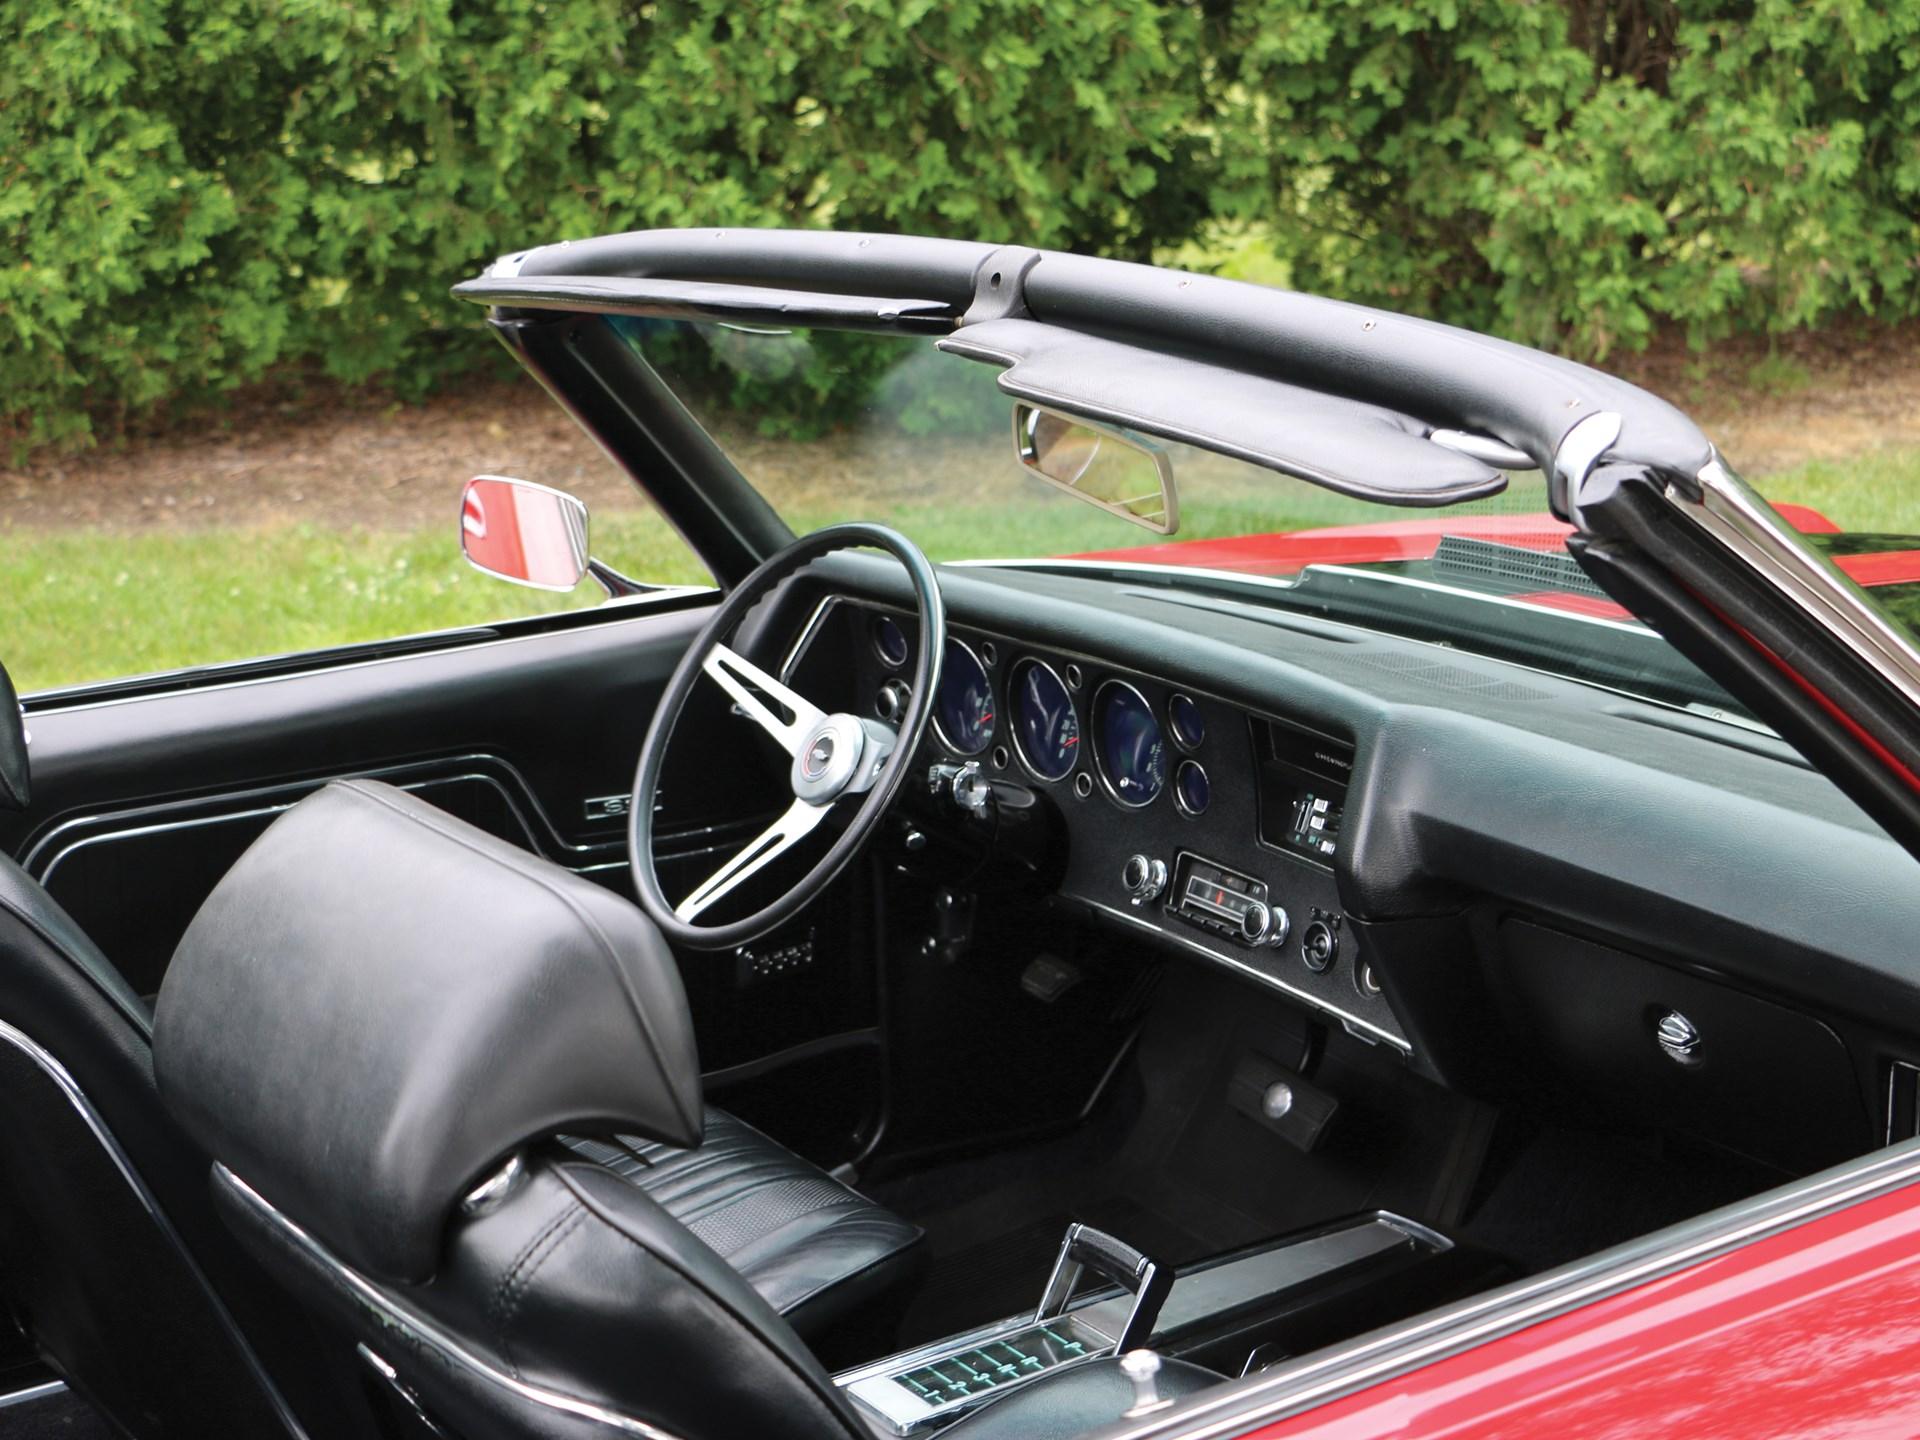 1970 Chevrolet Chevelle SS 454 Recreation